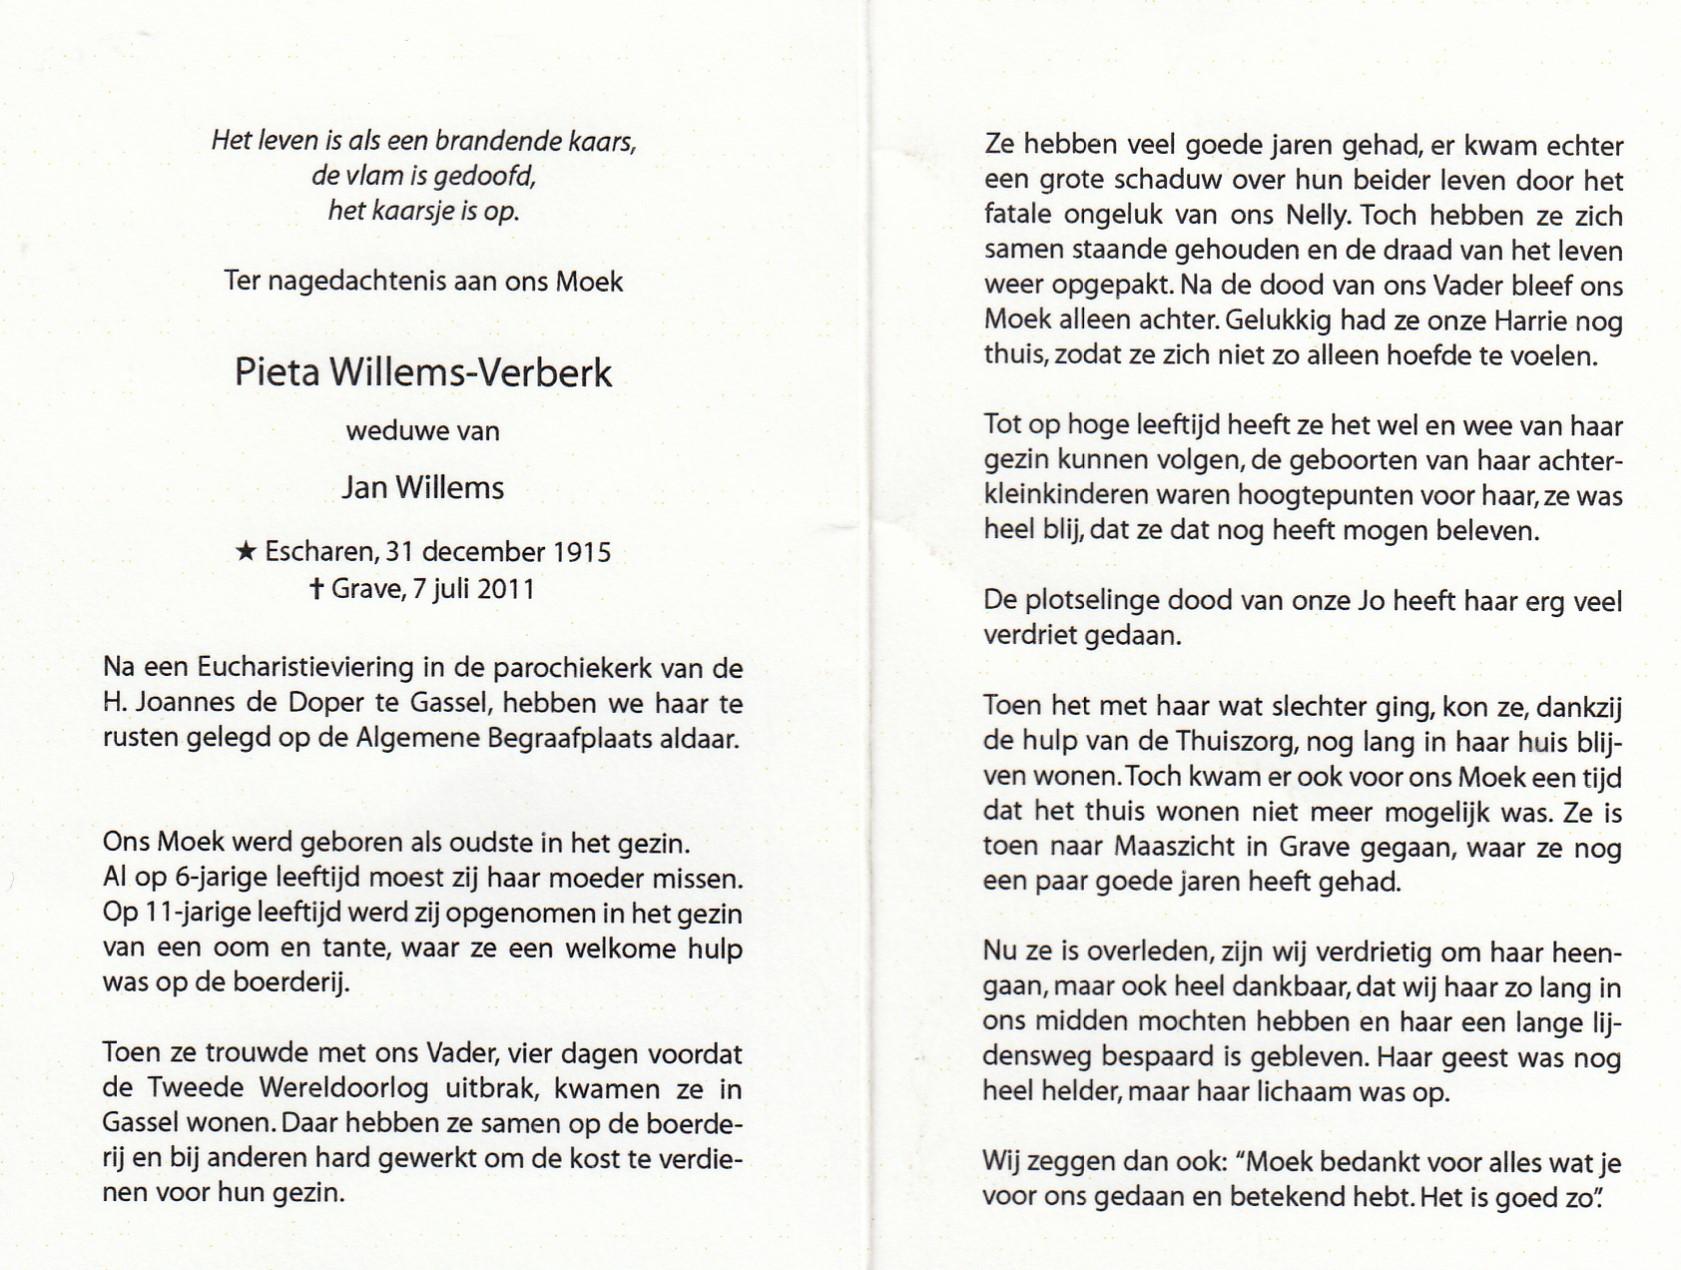 Bidprentje Pieta Verberk